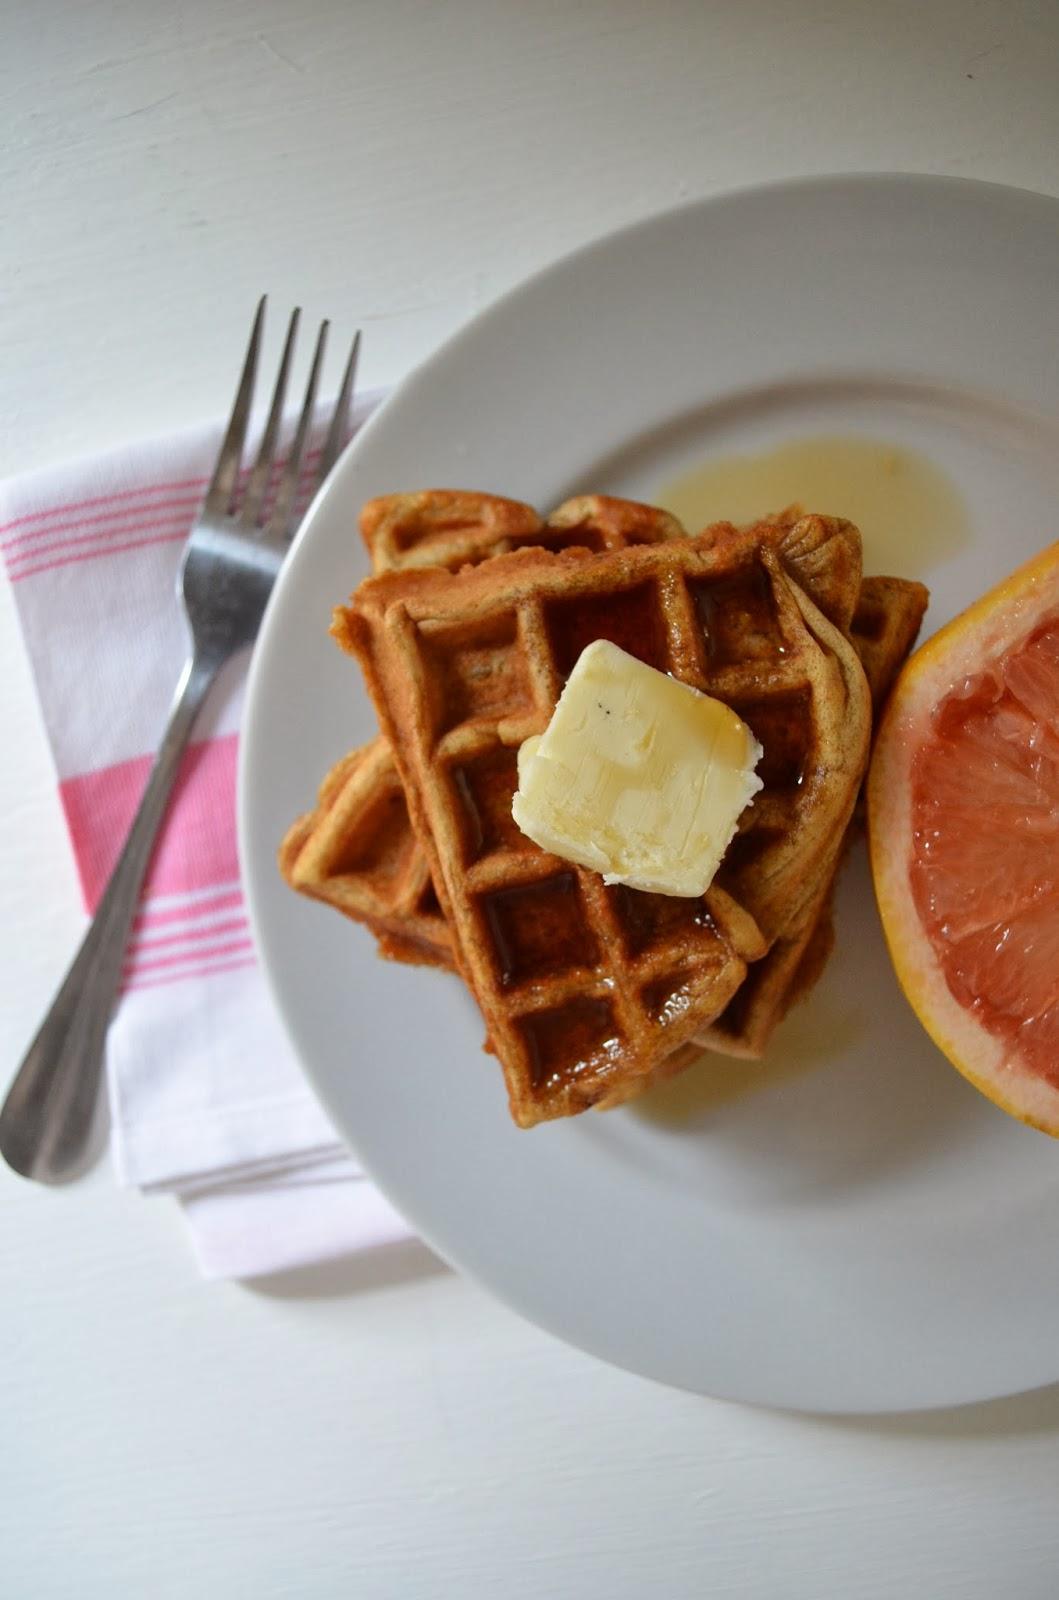 amour fou(d): rich buttermilk waffles.